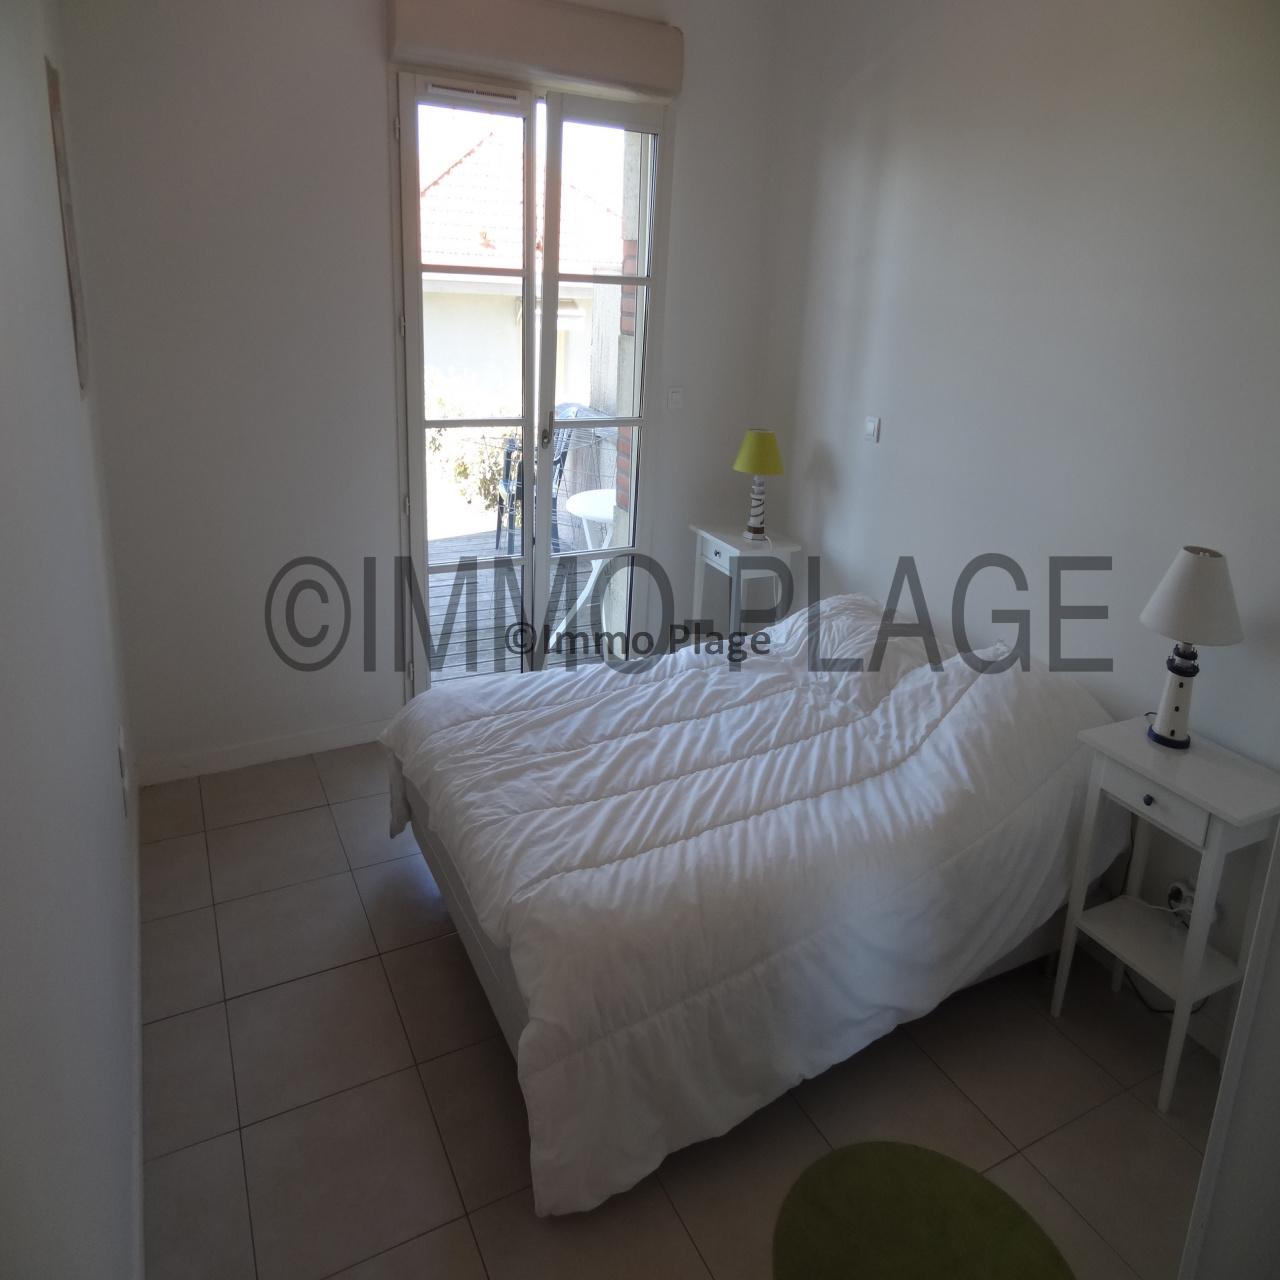 Image_11, Appartement, Soulac-sur-Mer, ref :3078